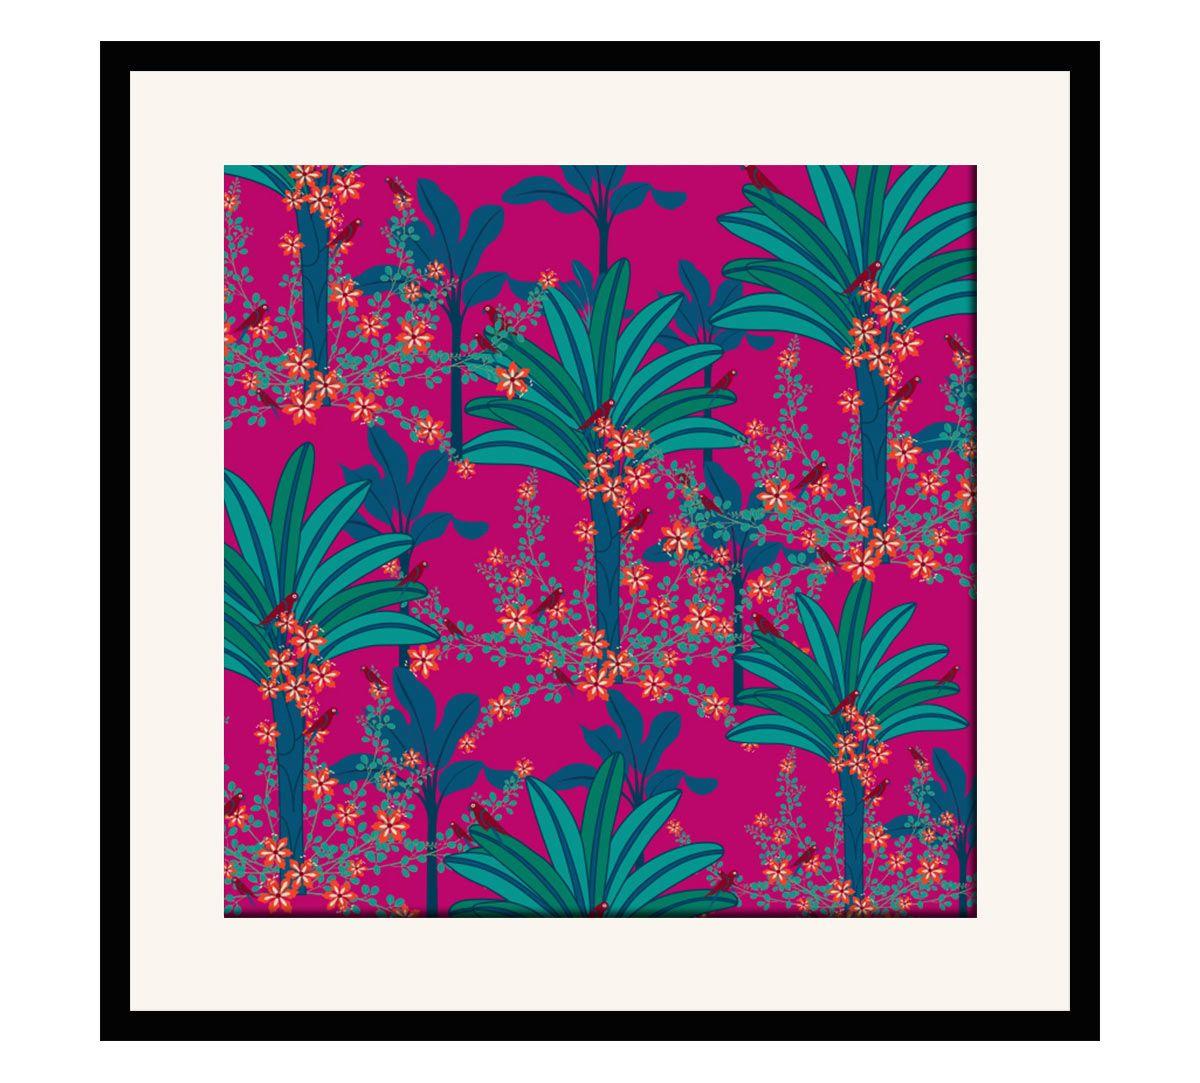 India Circus Royal Palms 16 x 16 and 24 x 24 Framed Wall Art